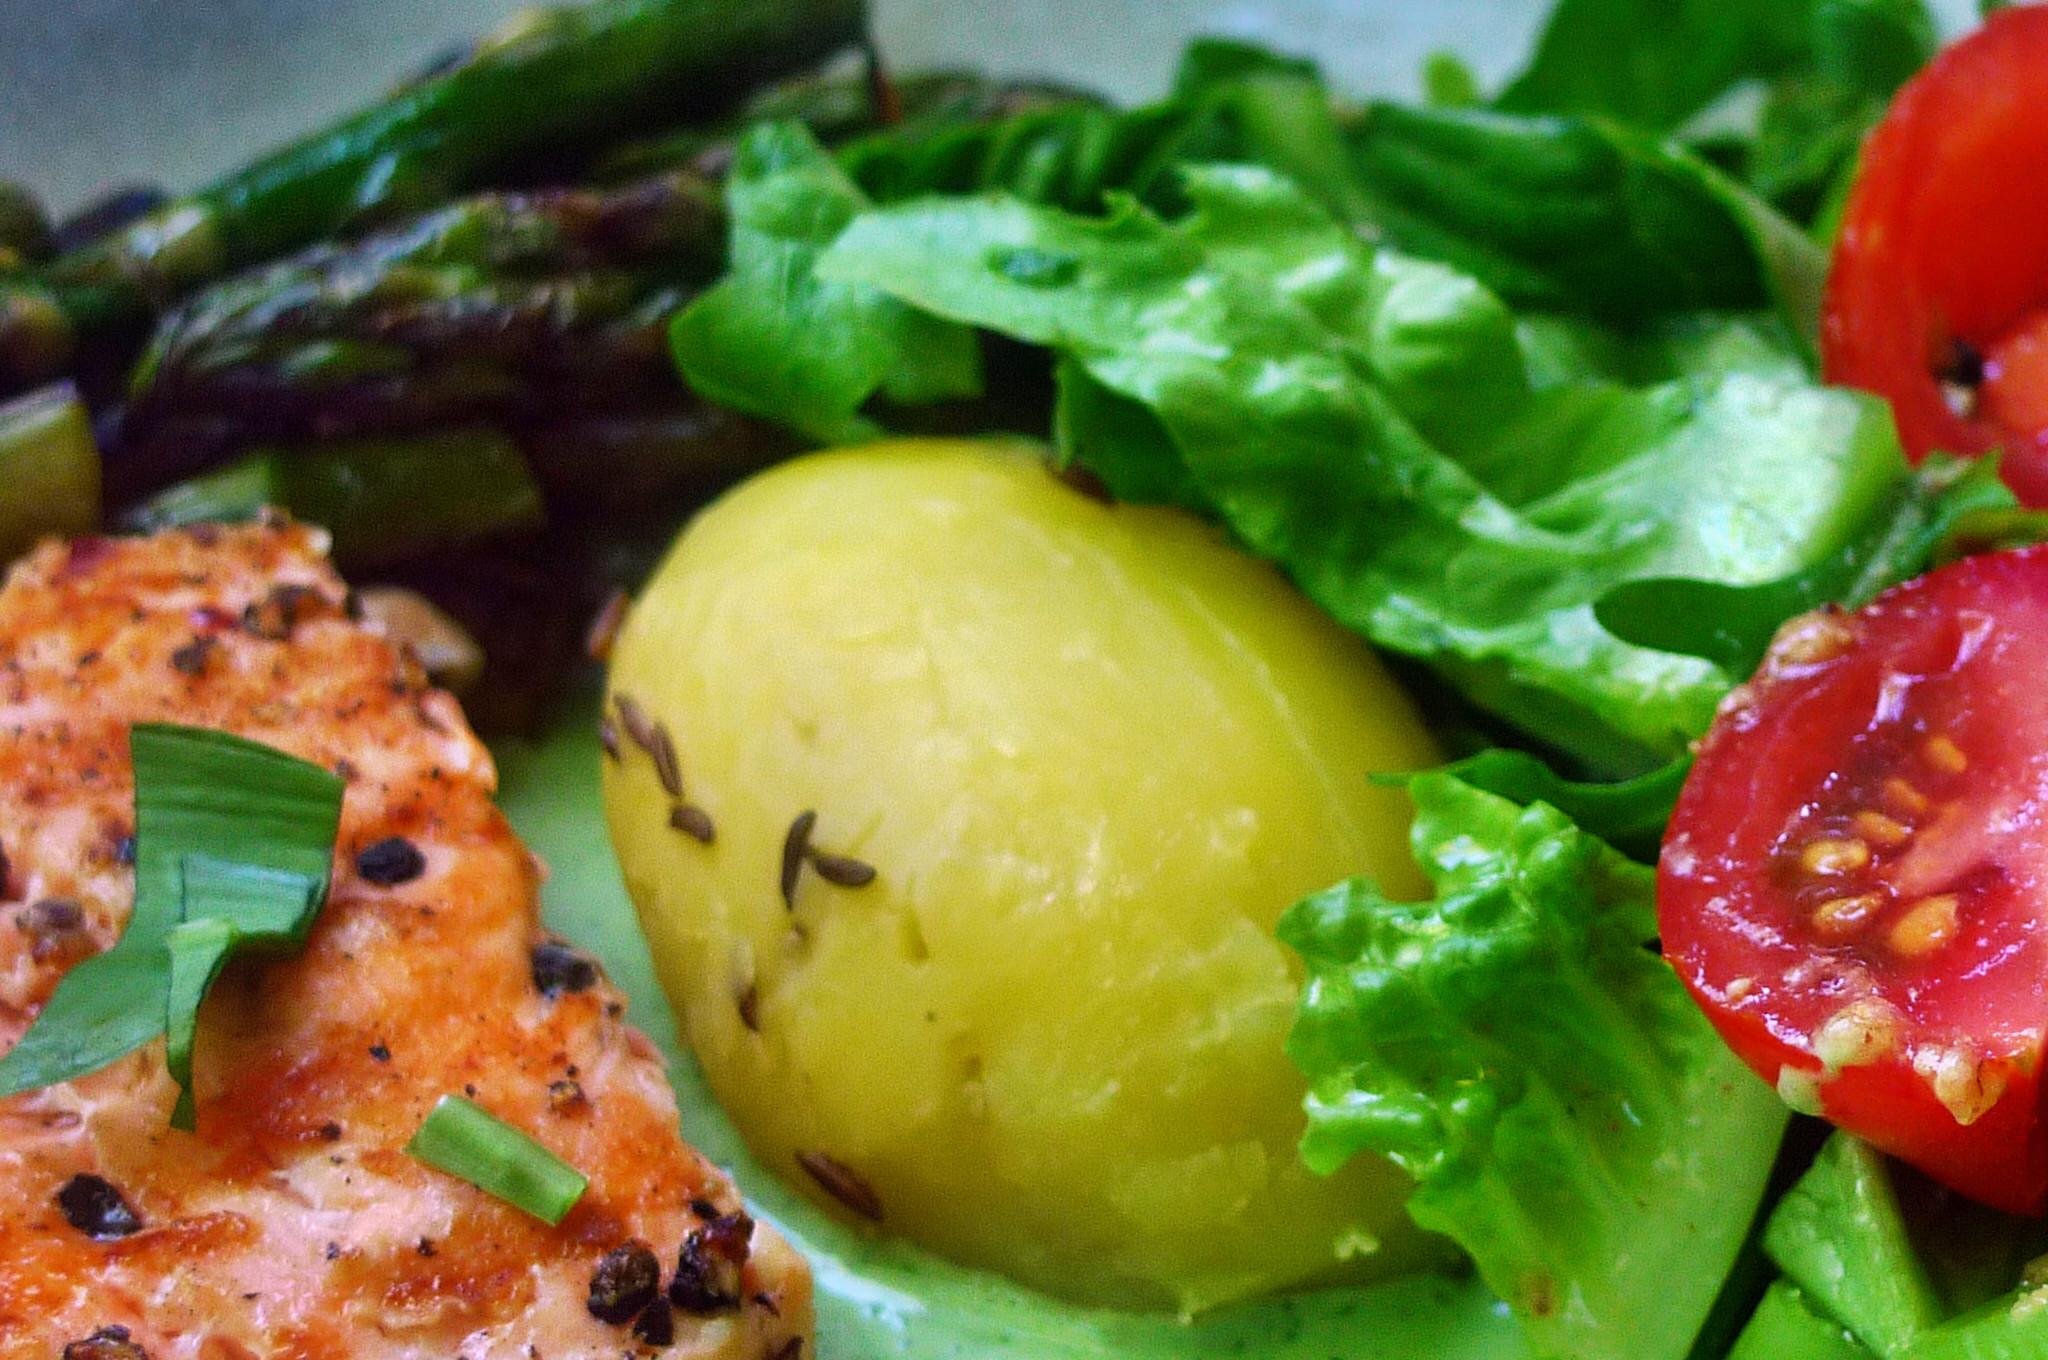 Lachs,Spargel,Dip,Salat,Kartoffel -10.5.15   (15)